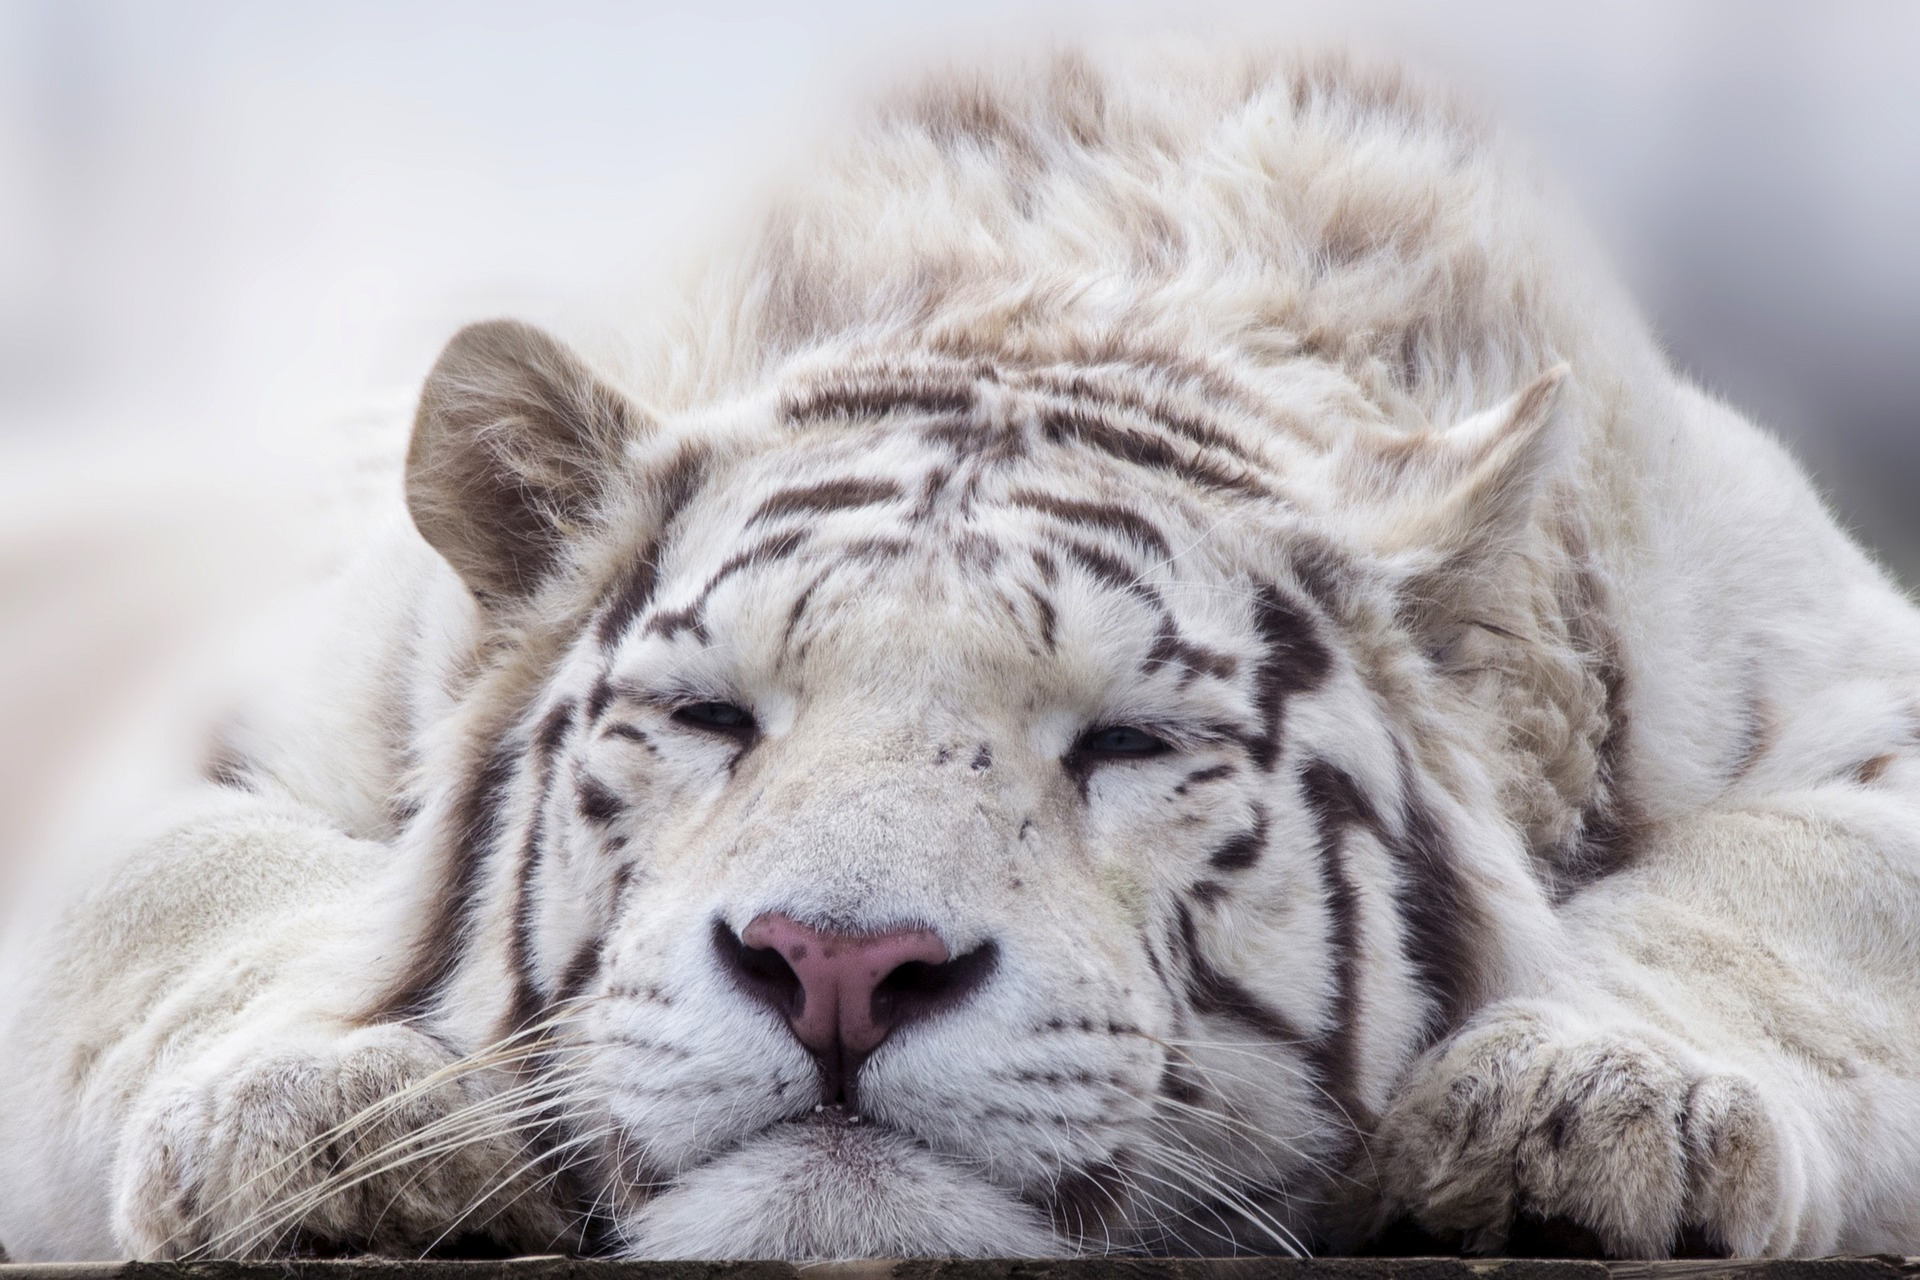 Tigerarbeit